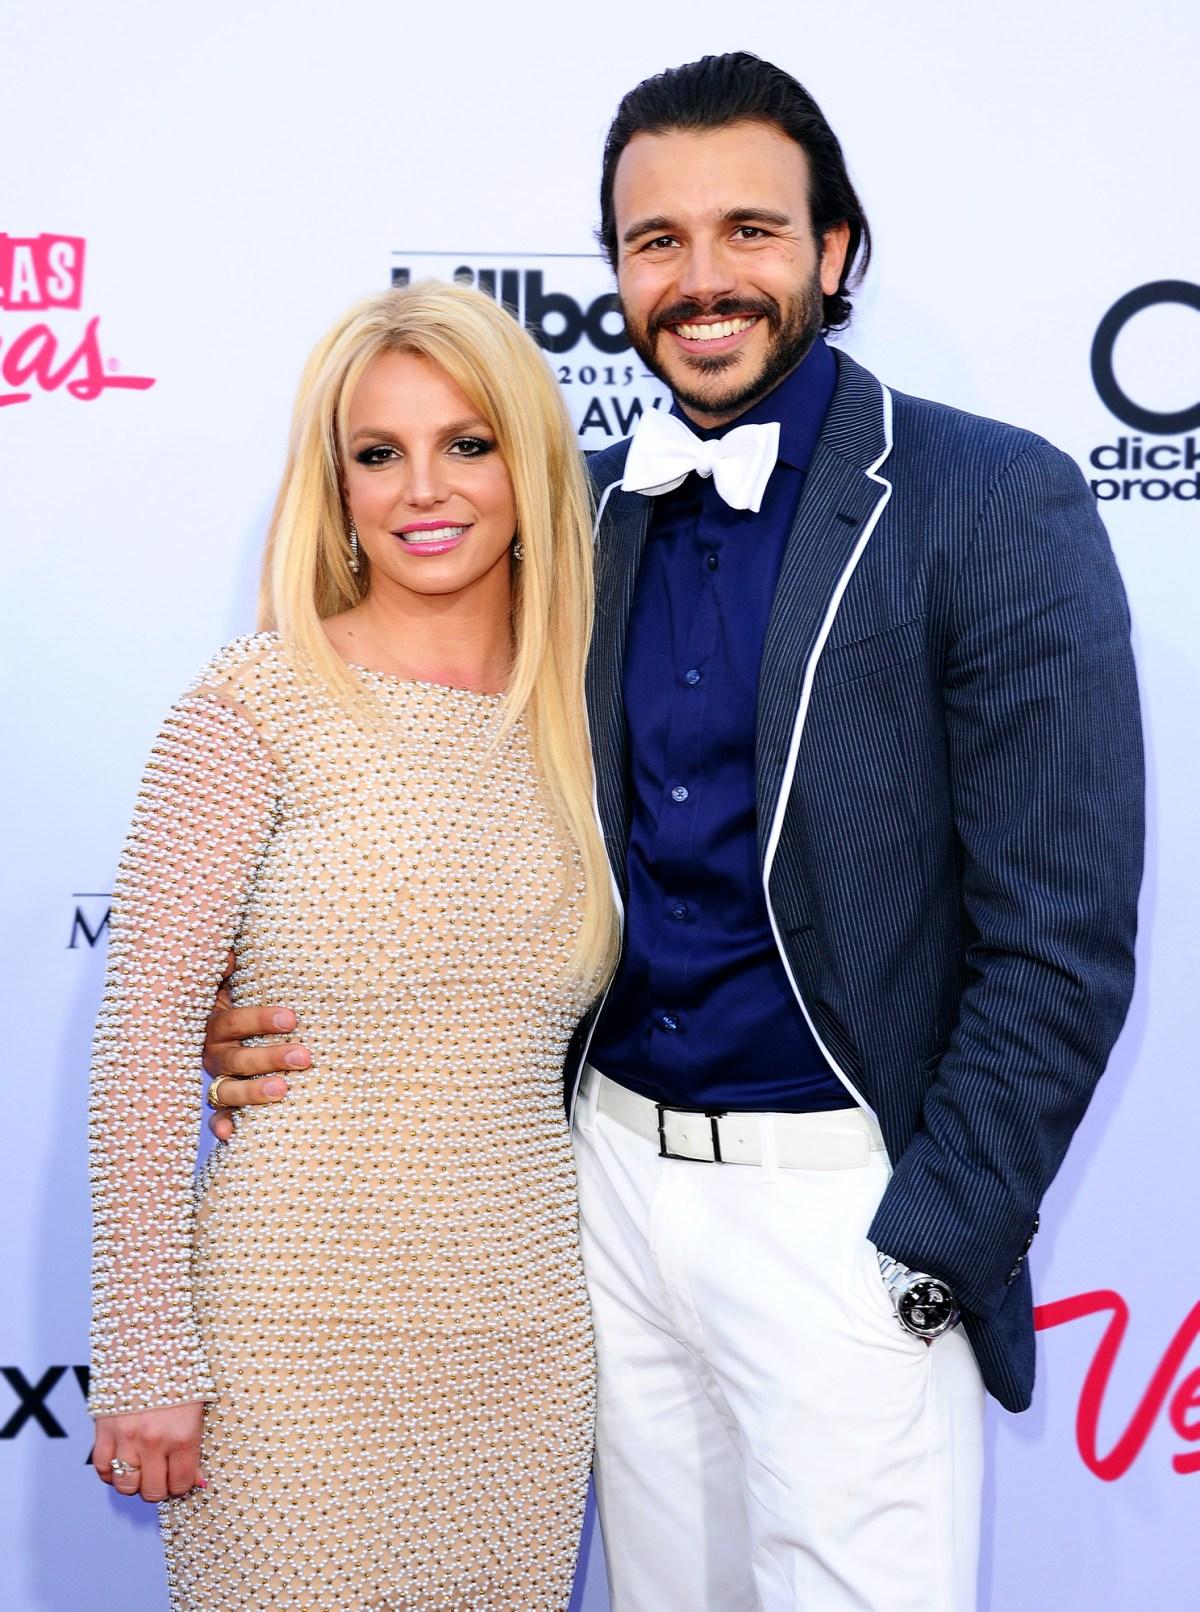 Britney dating history